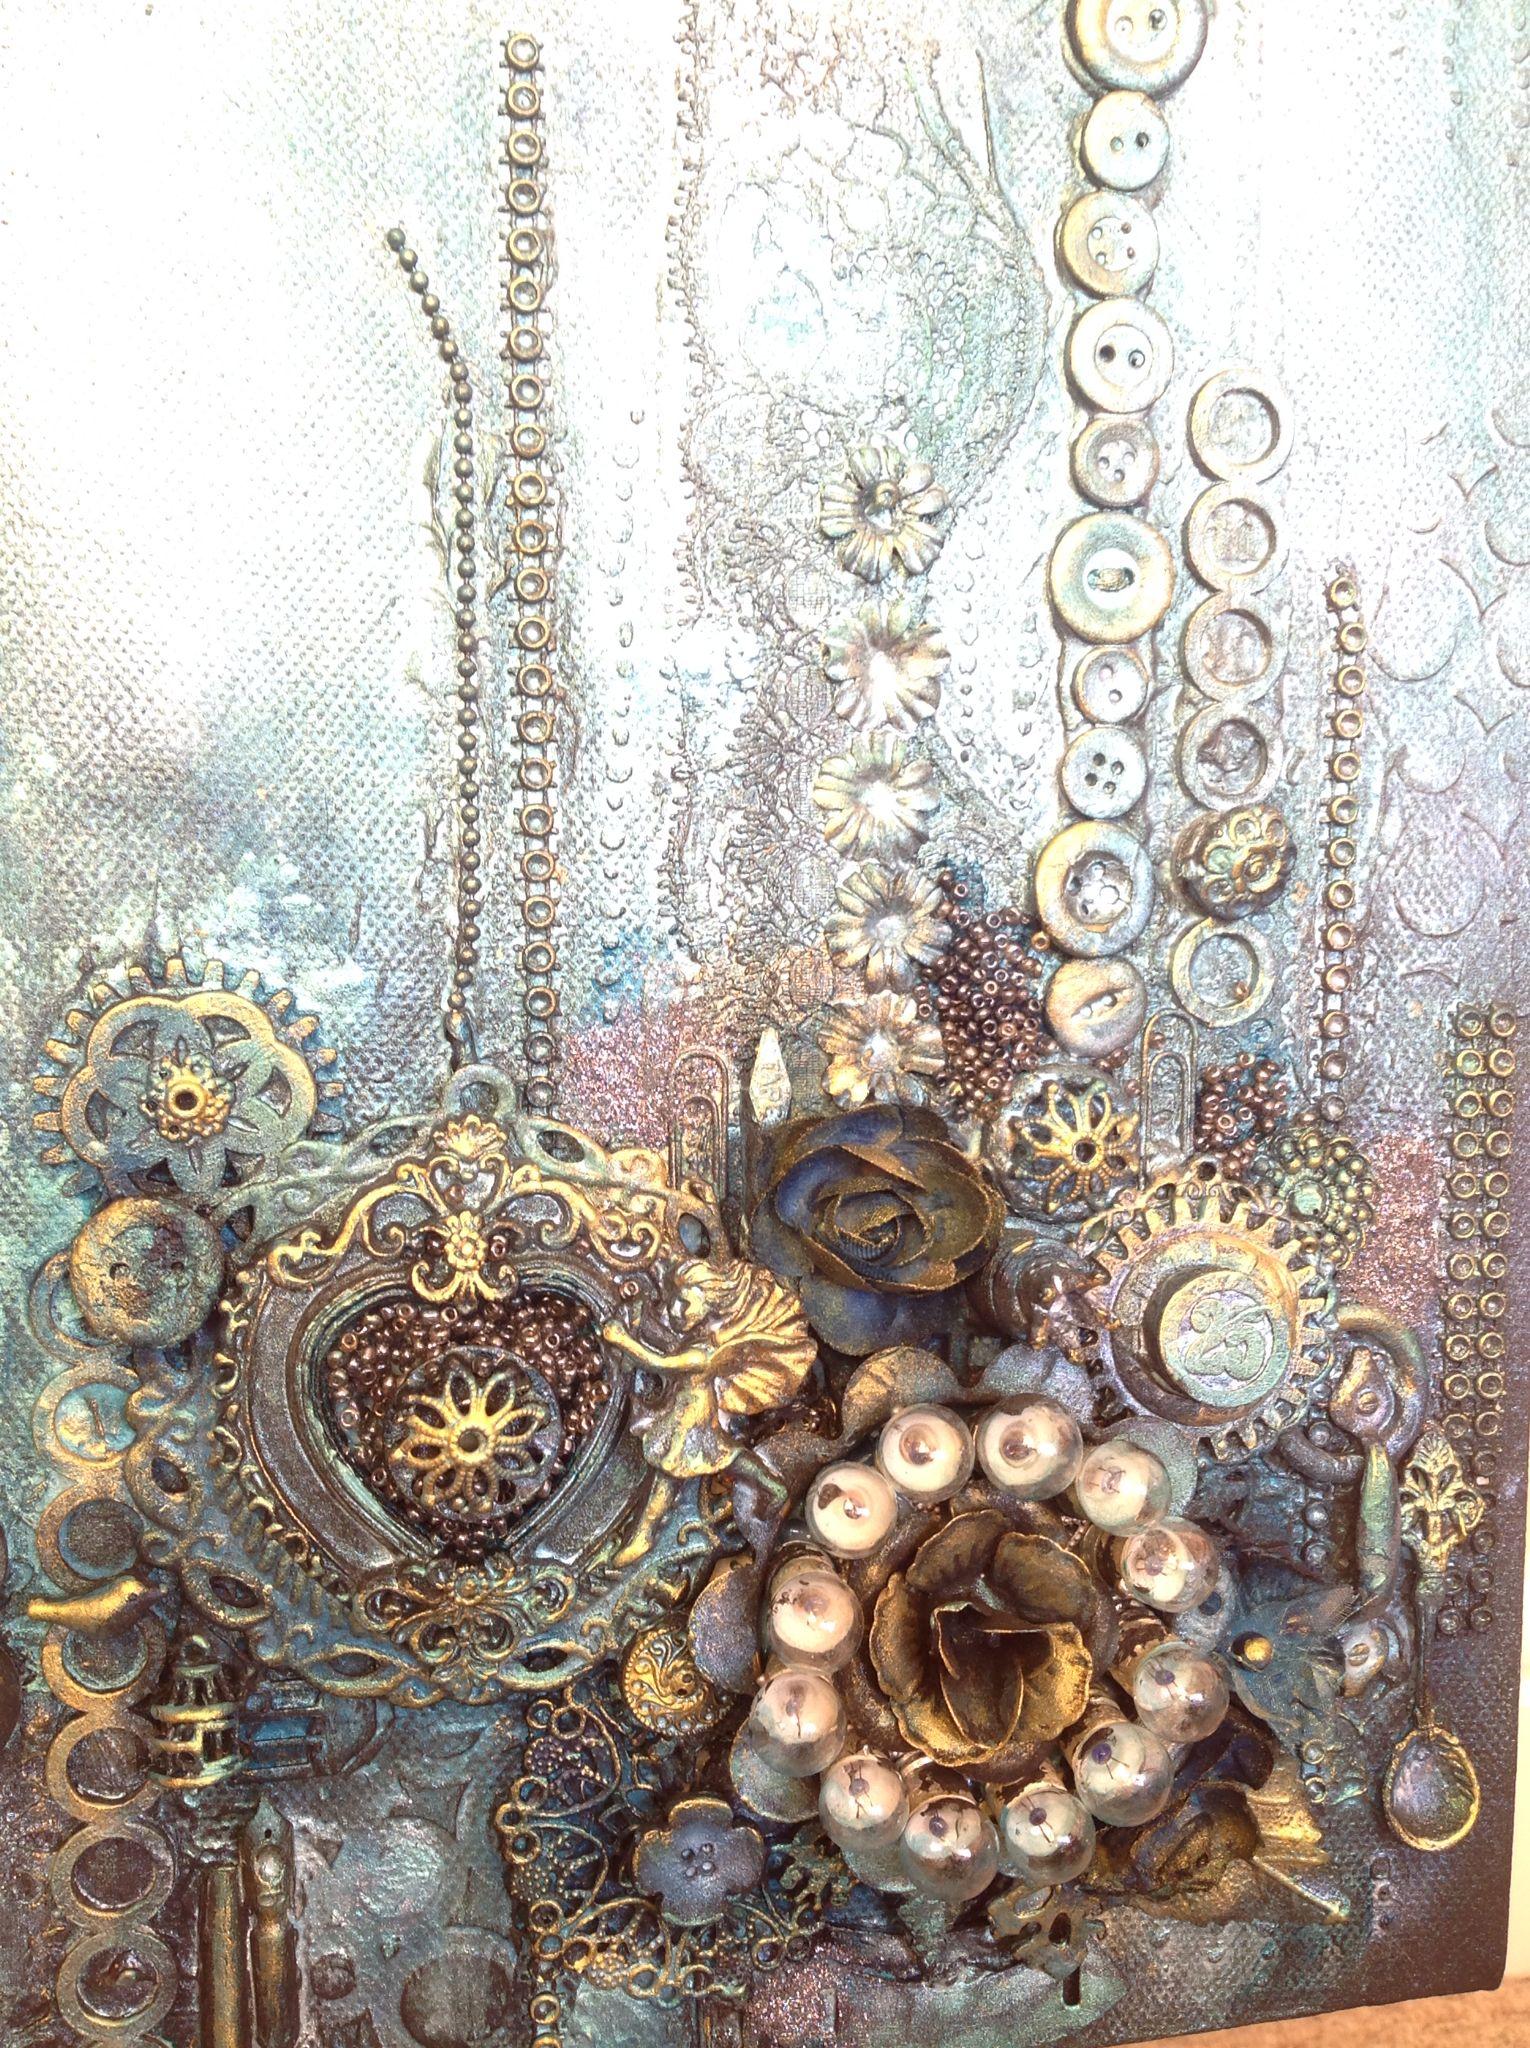 1000 ideas about mixed media canvas on pinterest for Mixed media canvas art ideas